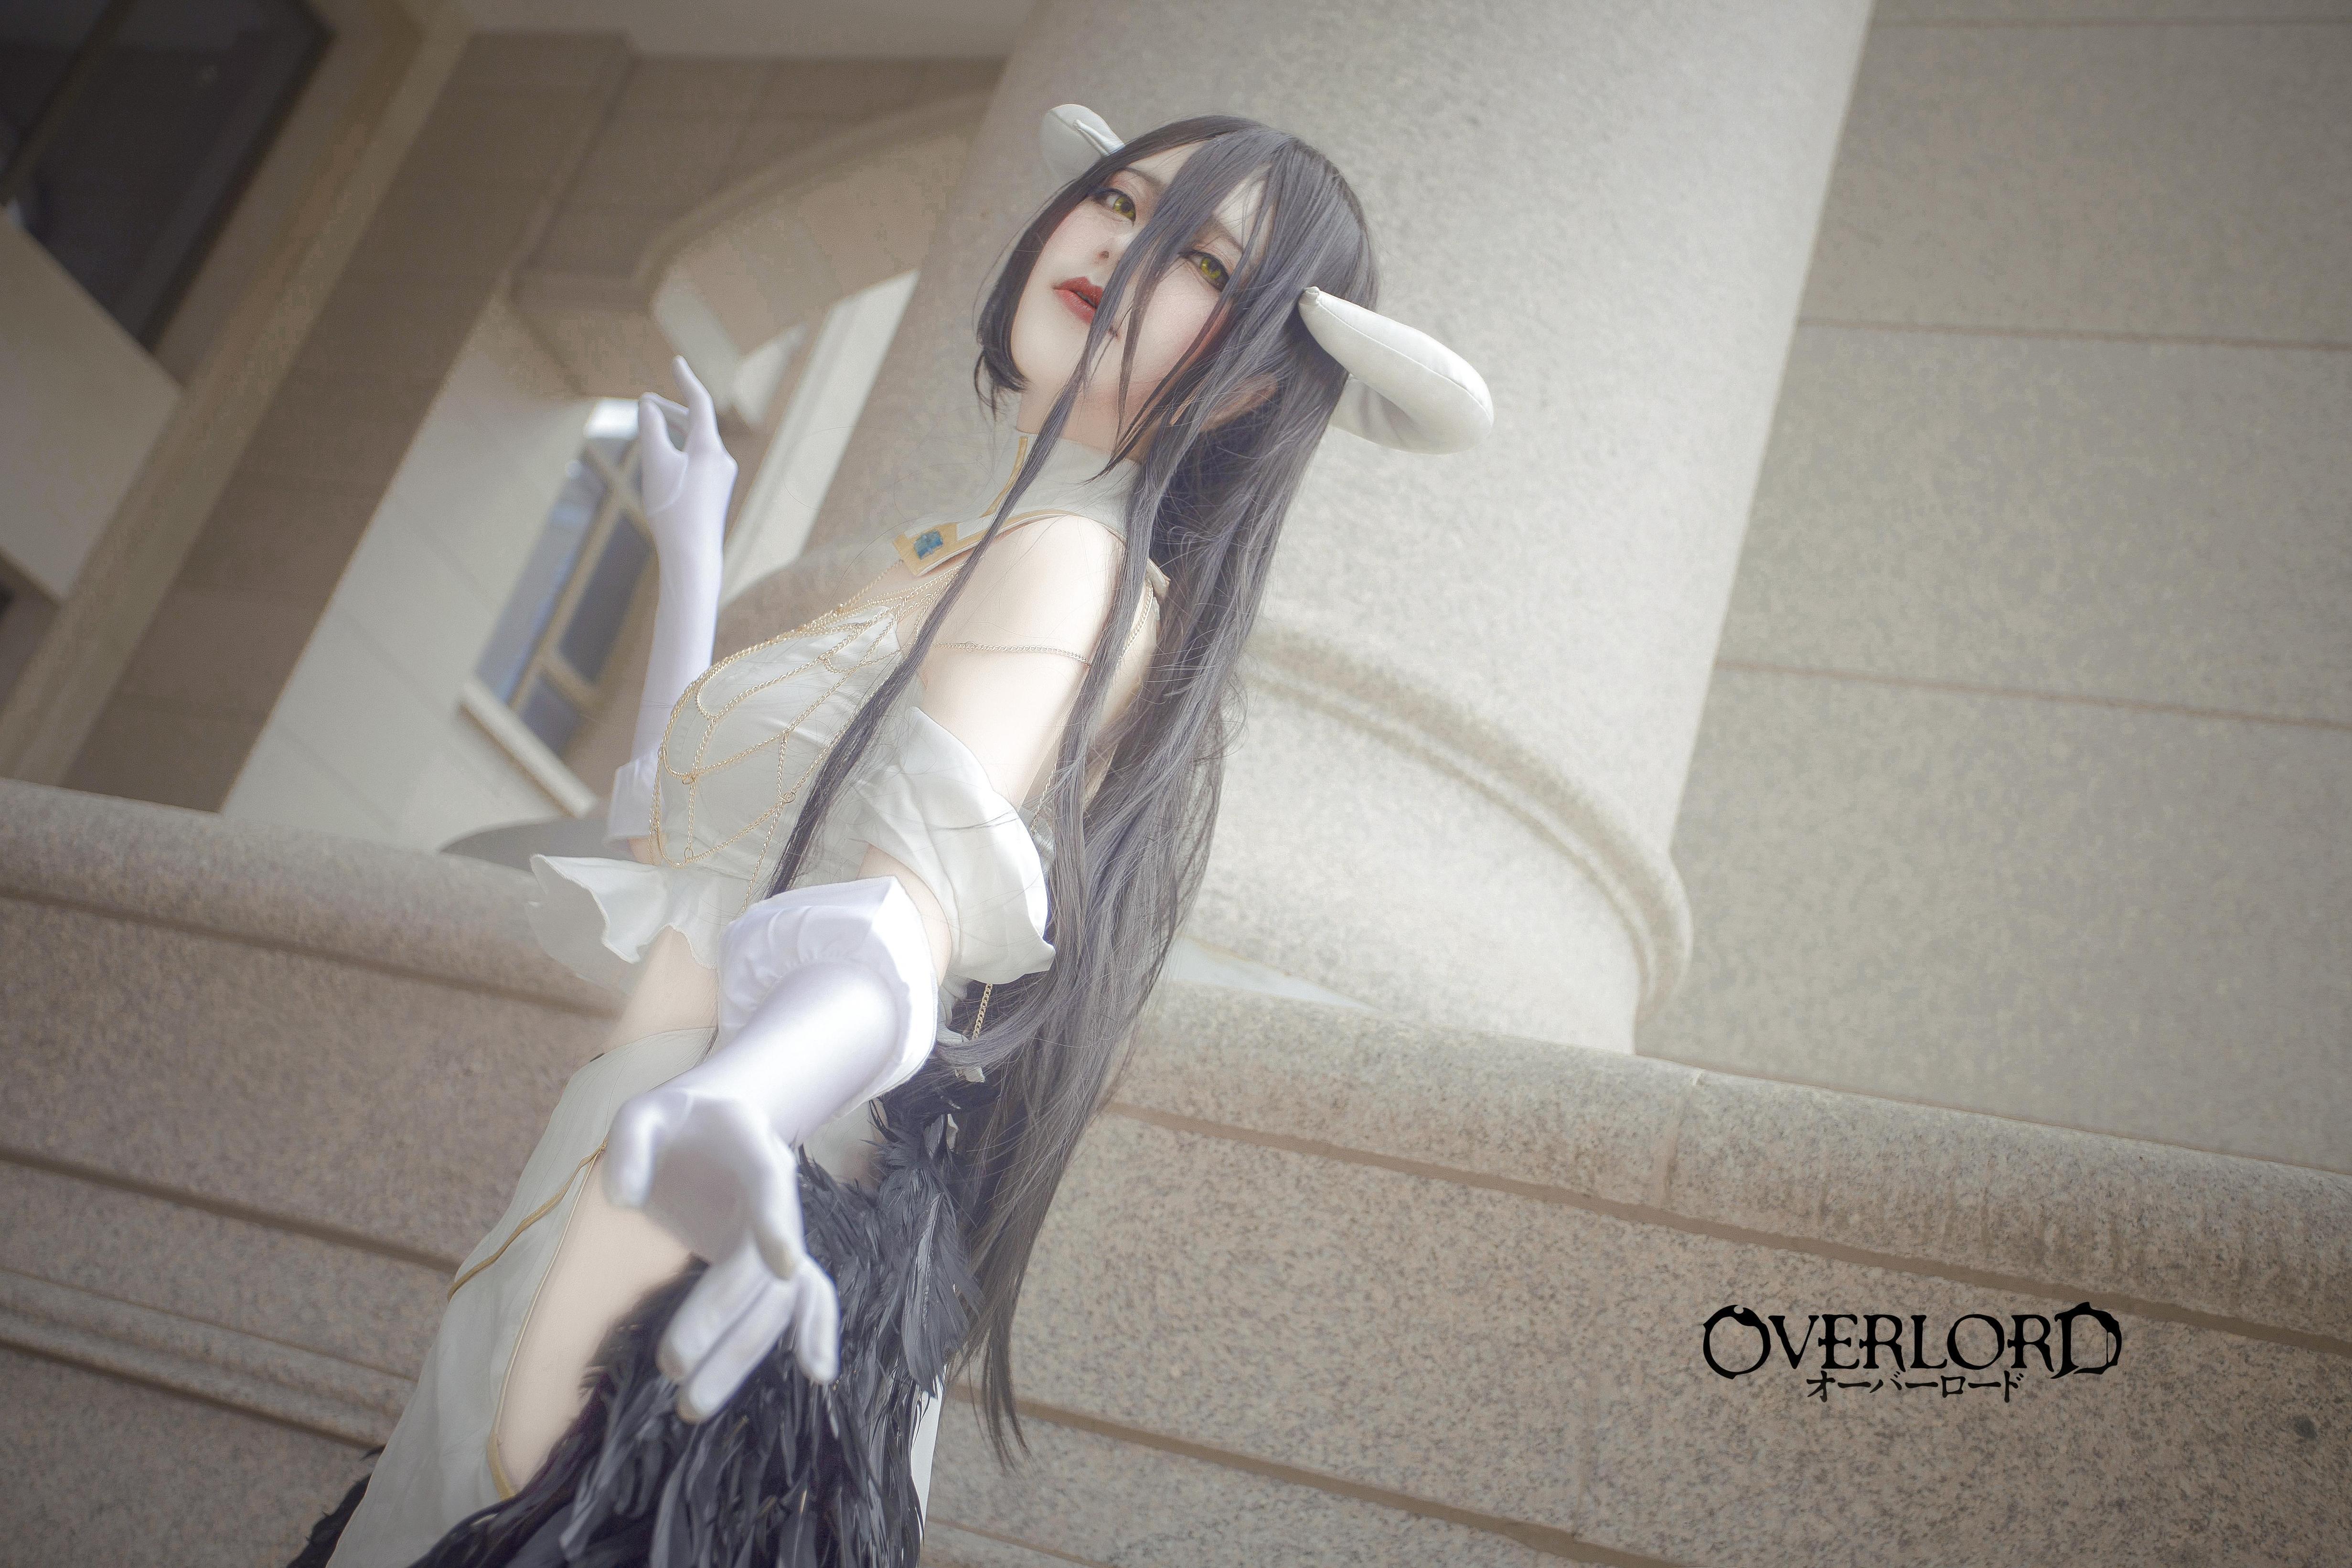 《OVERLORD》雅儿贝德cosplay【CN:百里.富贵】-第1张